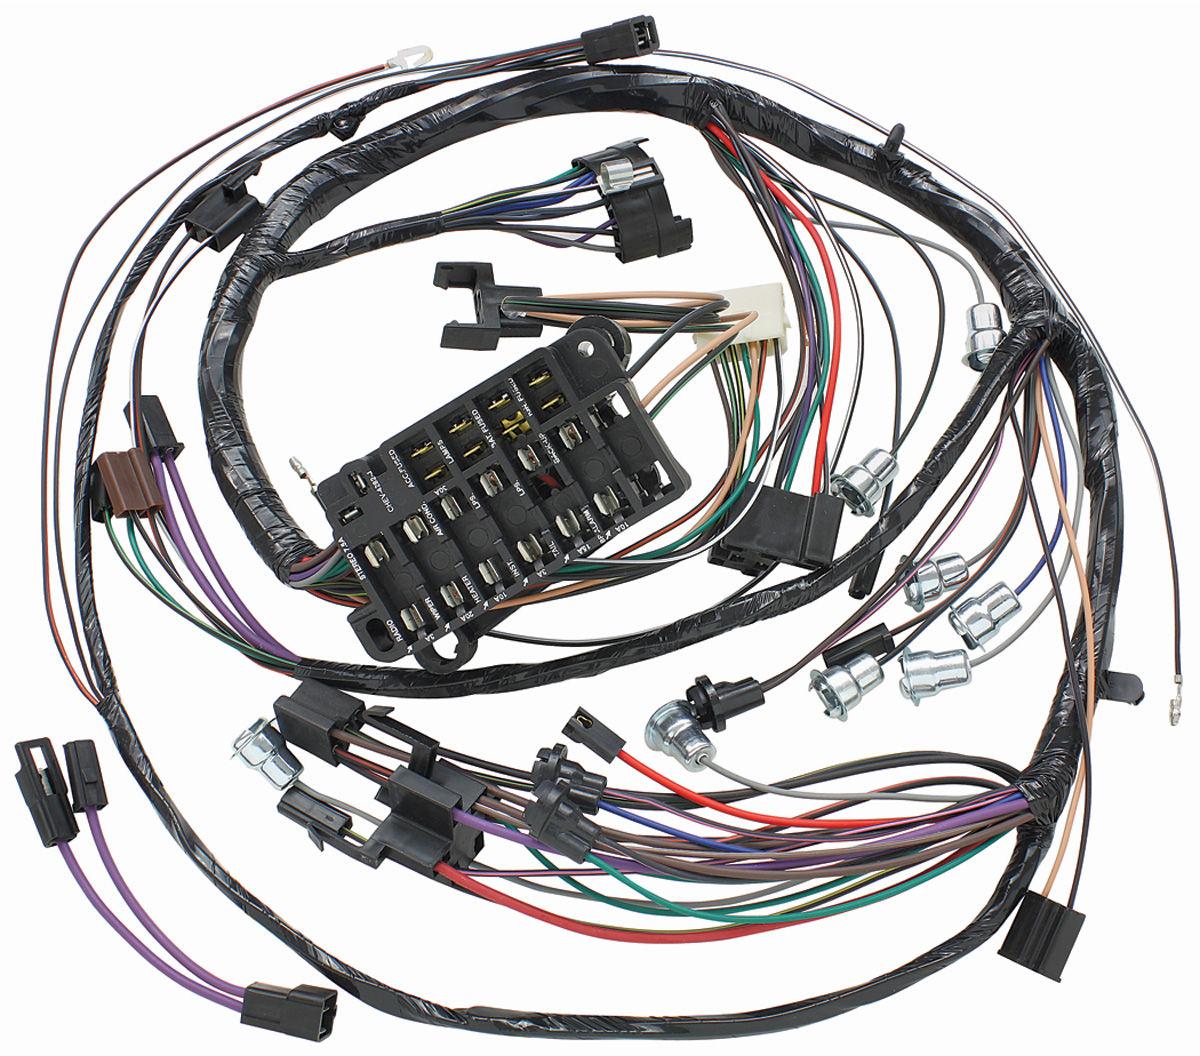 1966 Chevelle Wiring Harness Completed Wiring Diagram Alternator A Bertarellisavino It